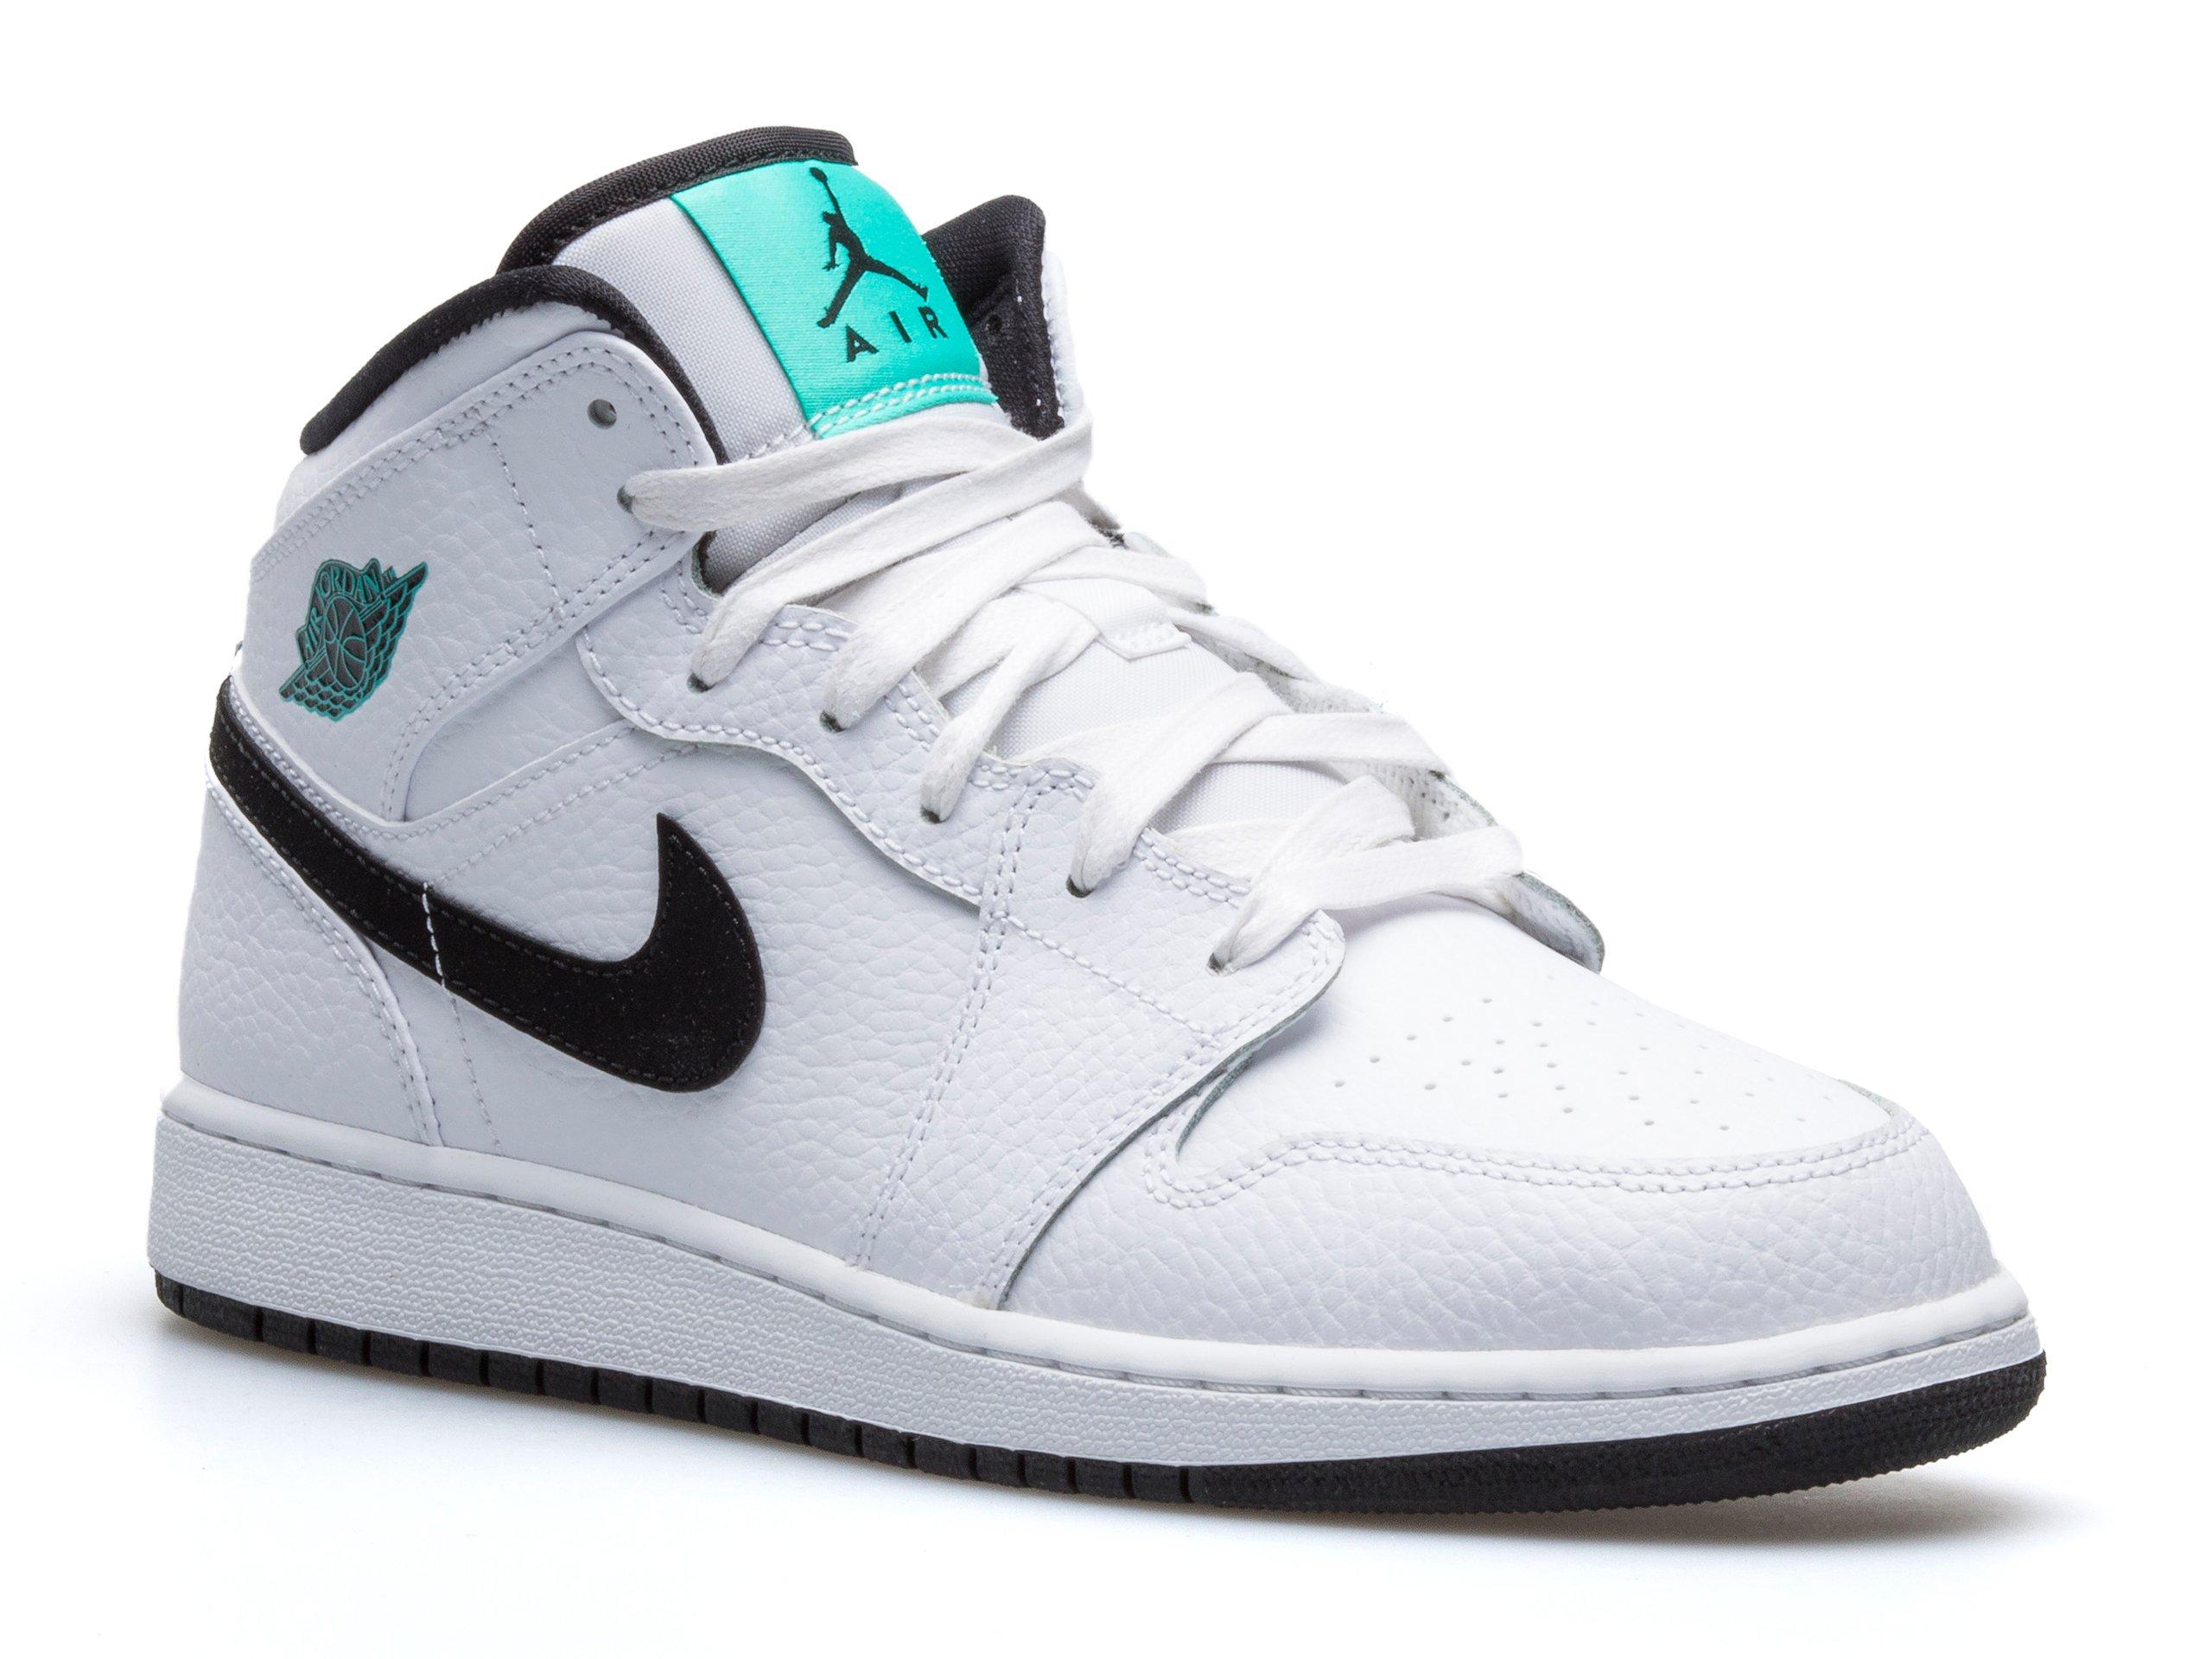 new concept e8833 944d7 ... factory sneaker 1ee41 cf9fb Buty NIKE AIR JORDAN 1 MID BG 554725- ...